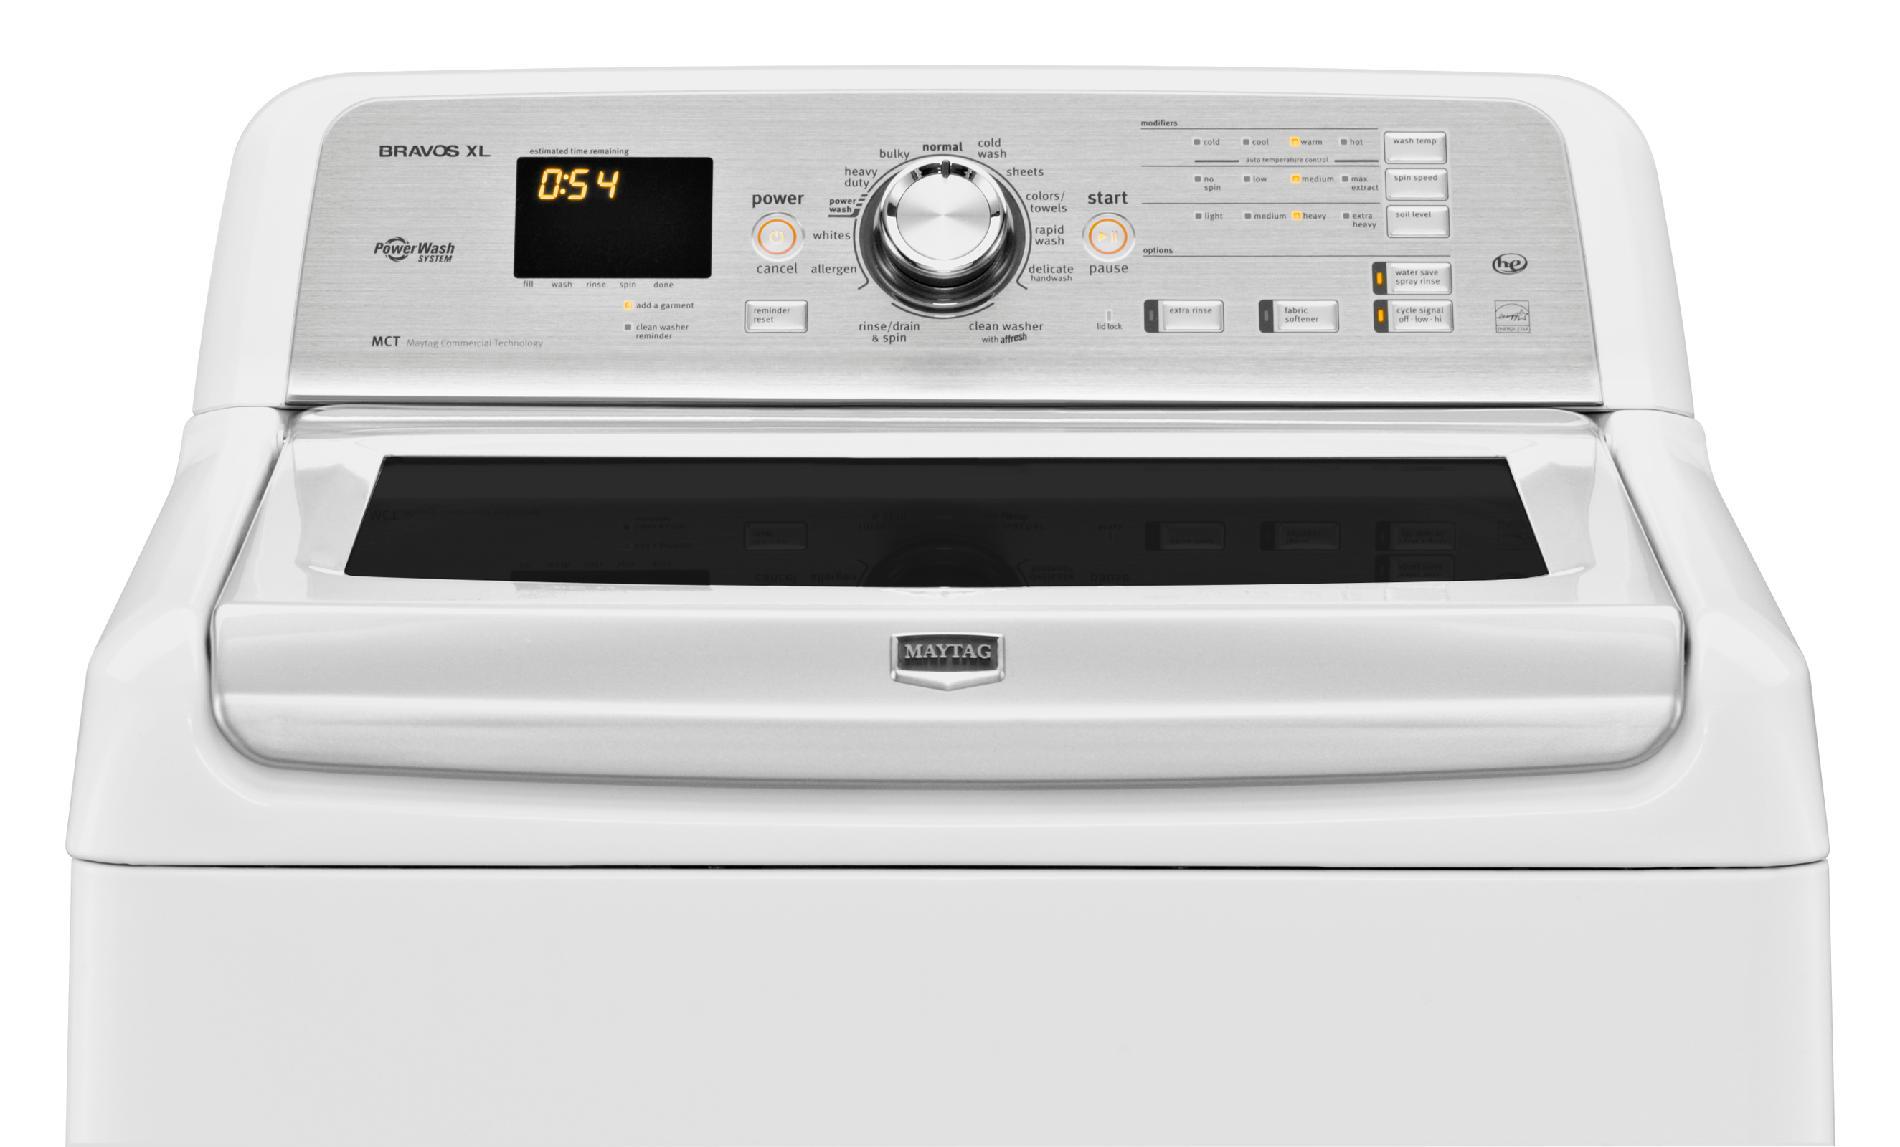 Maytag MVWB880BW 4.8 cu. ft. Bravos XL® High-Efficiency Top-Load Washer - White